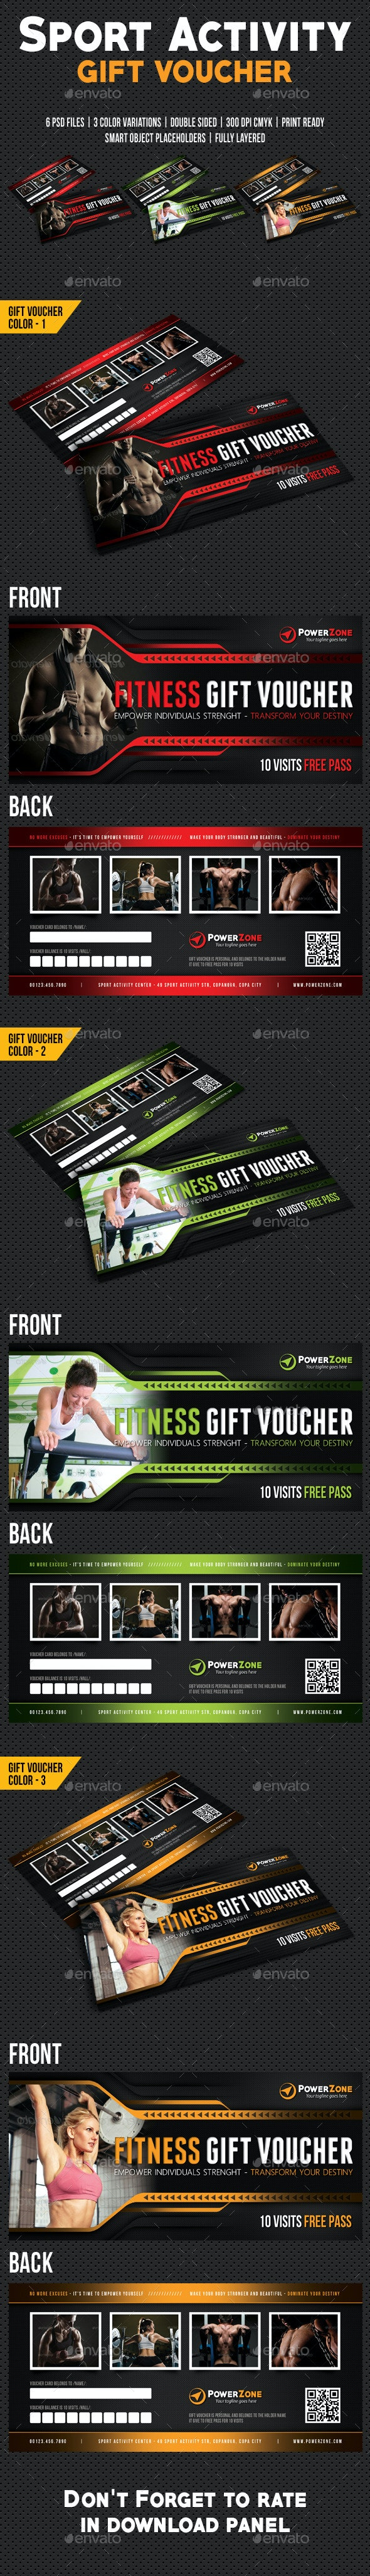 Sport Activity Gift Voucher 04 - Cards & Invites Print Templates